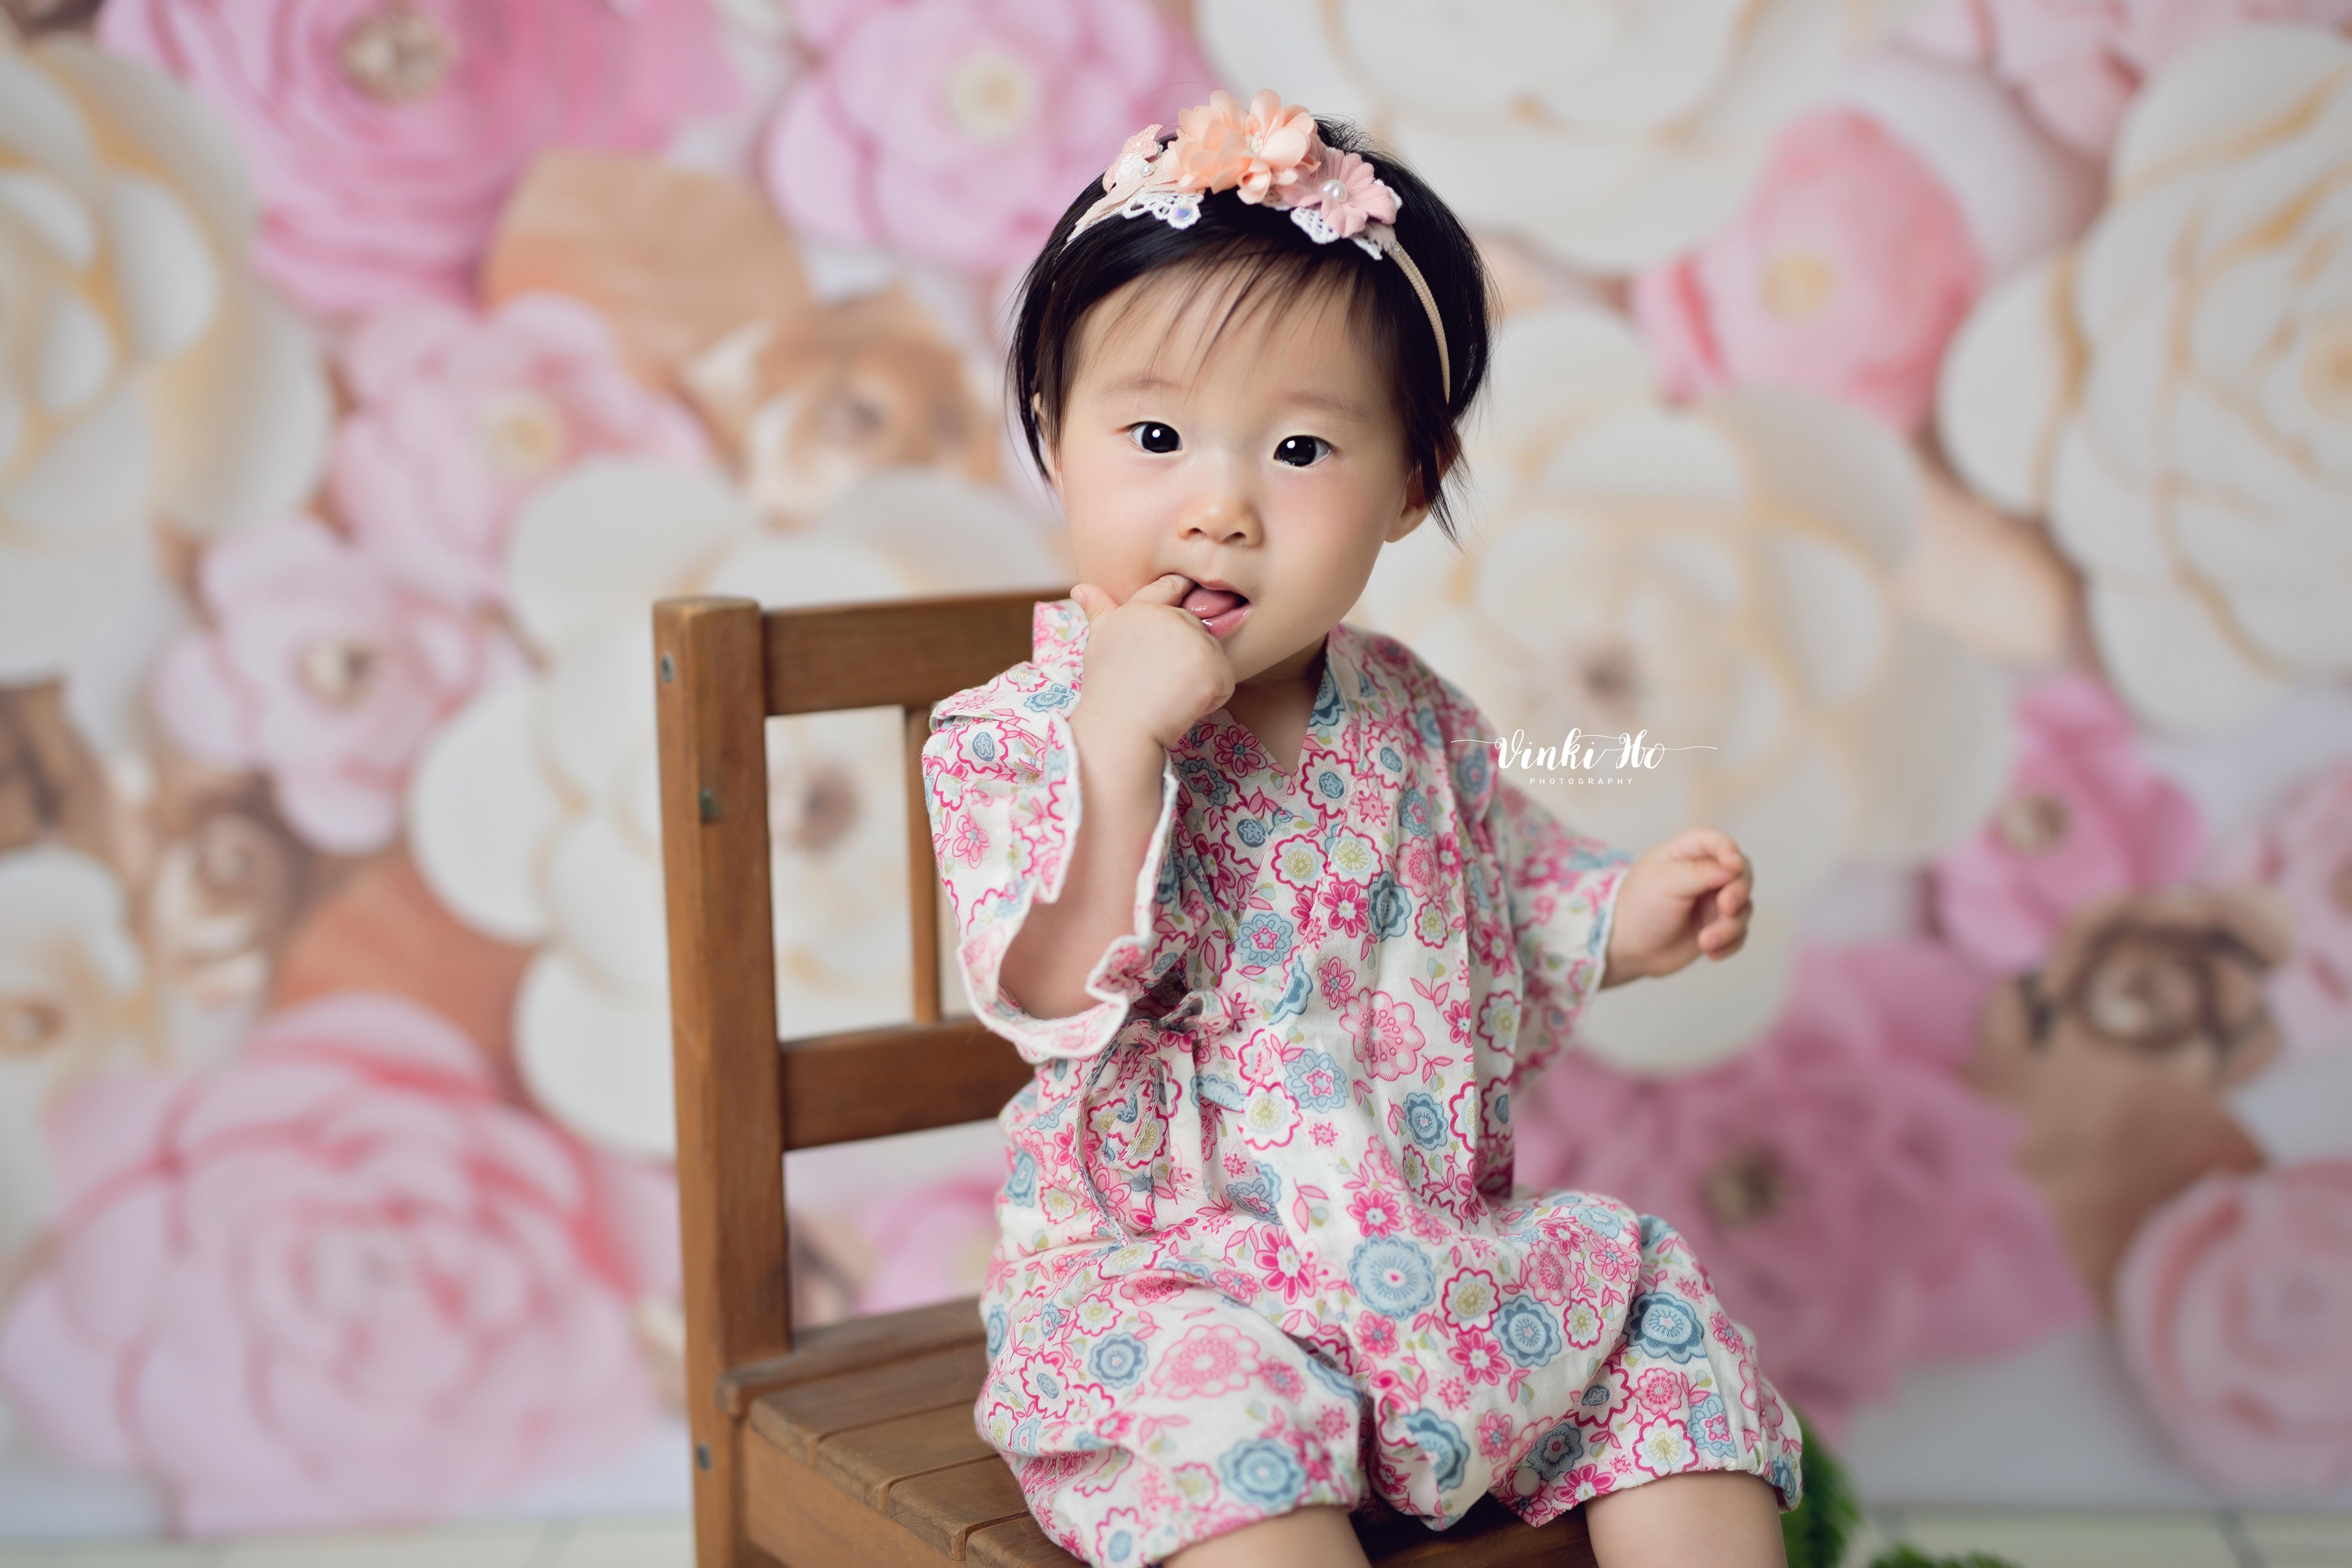 Studio_Baby Mayen 9mth old